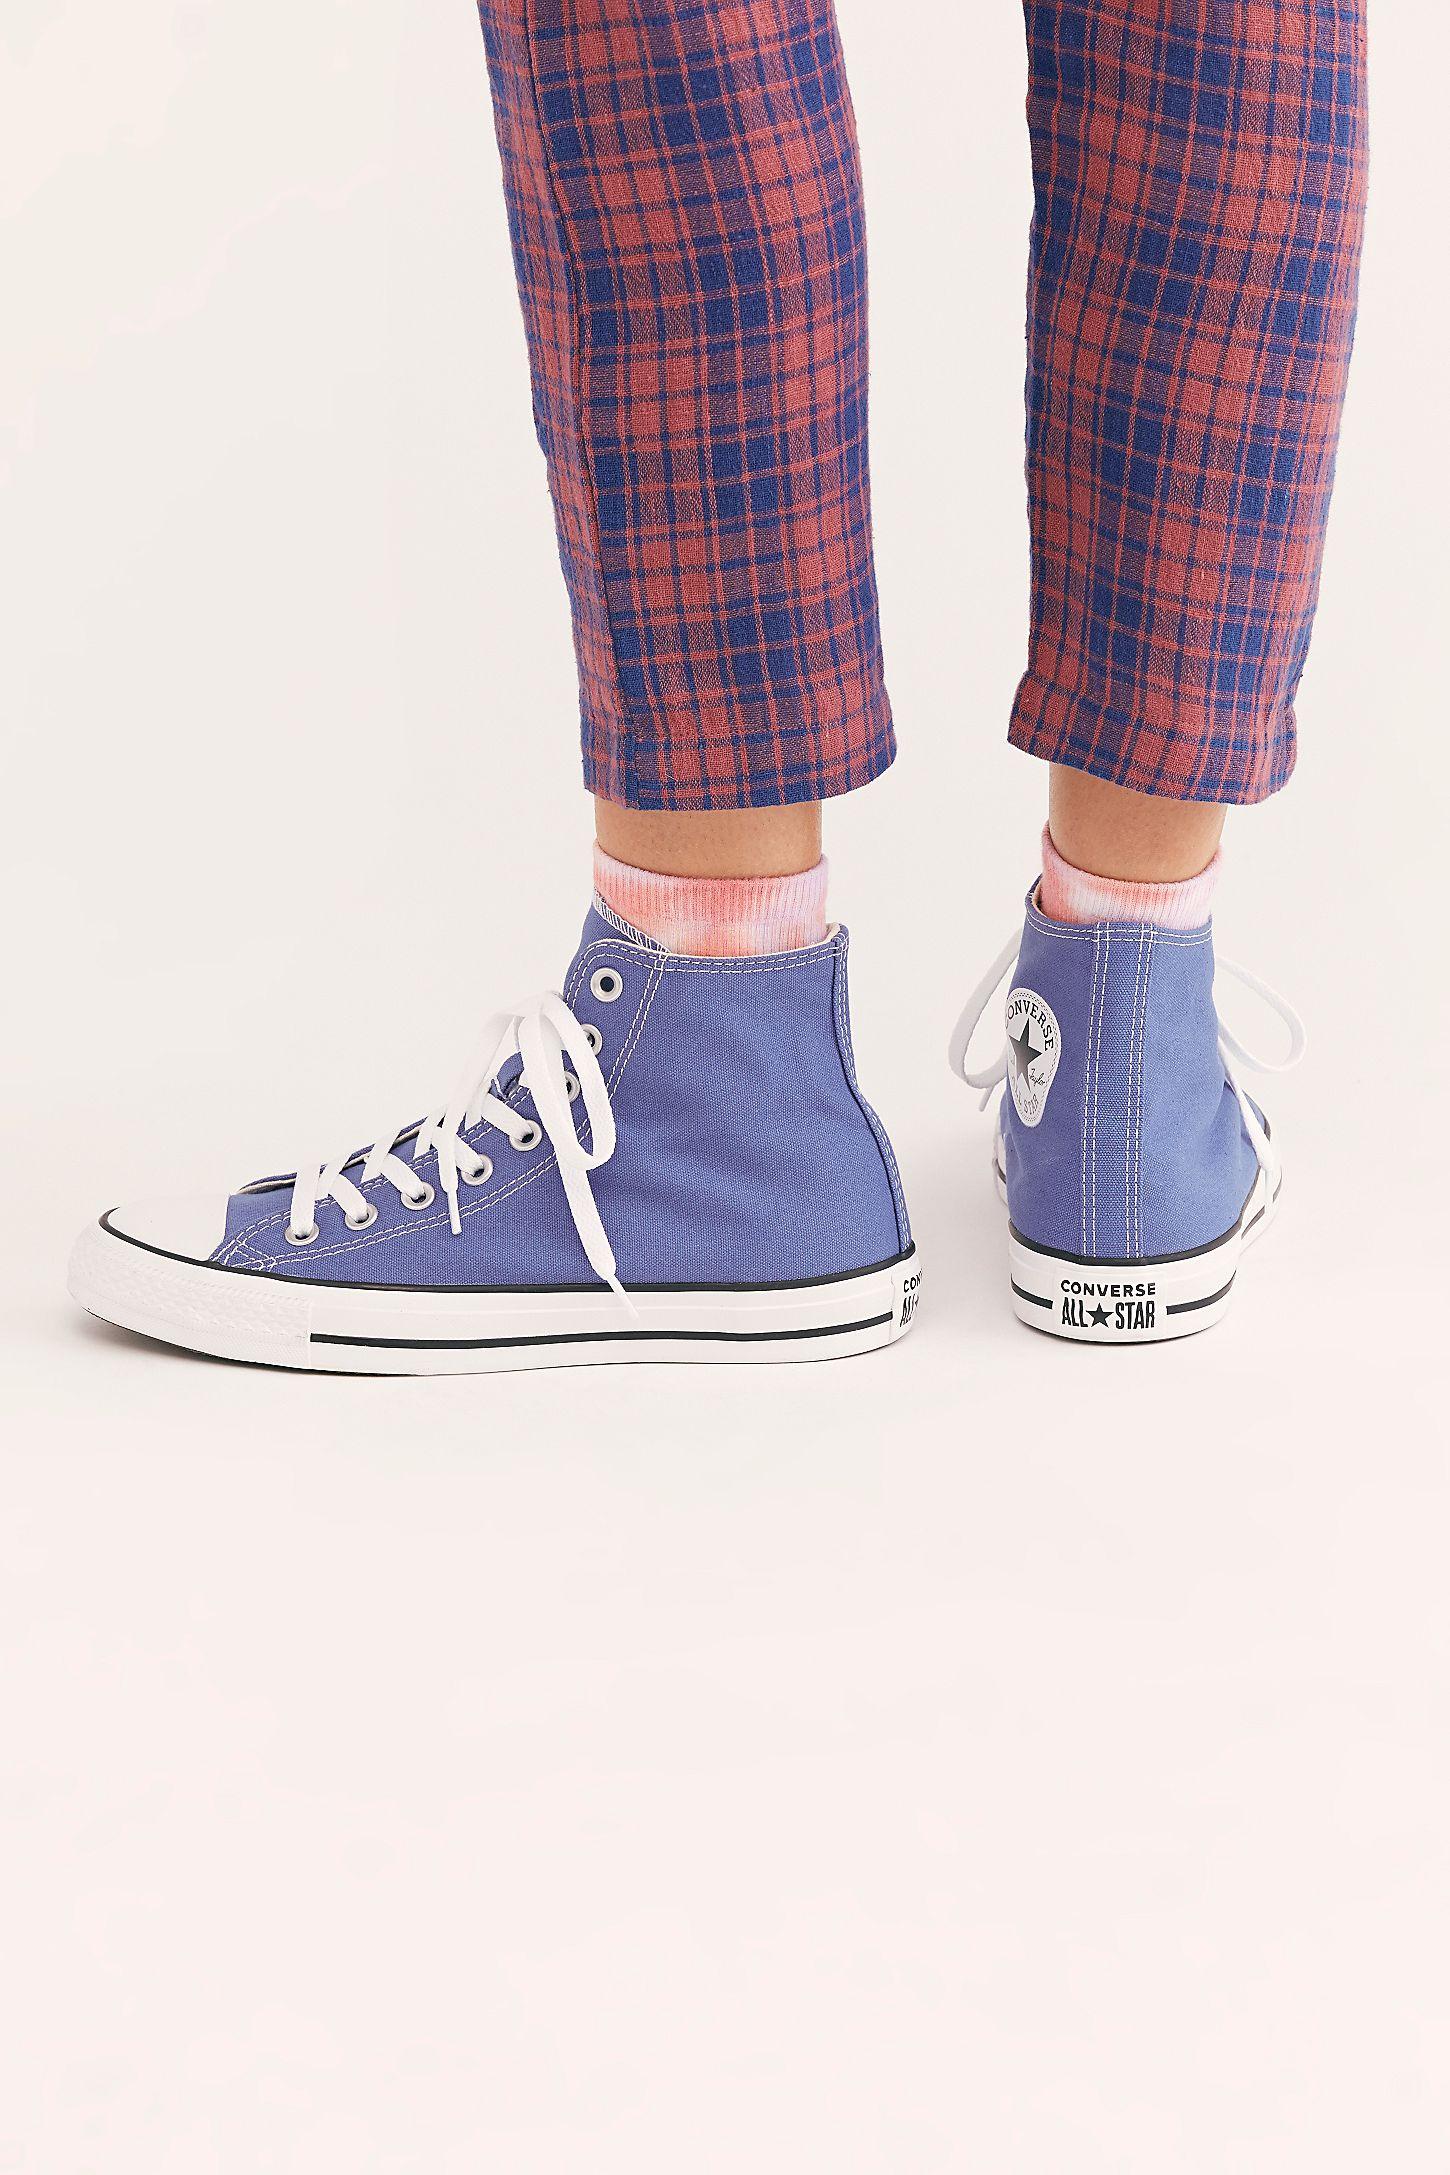 666e63024dc Slide View 4: Charlie Hi Top Converse Sneaker